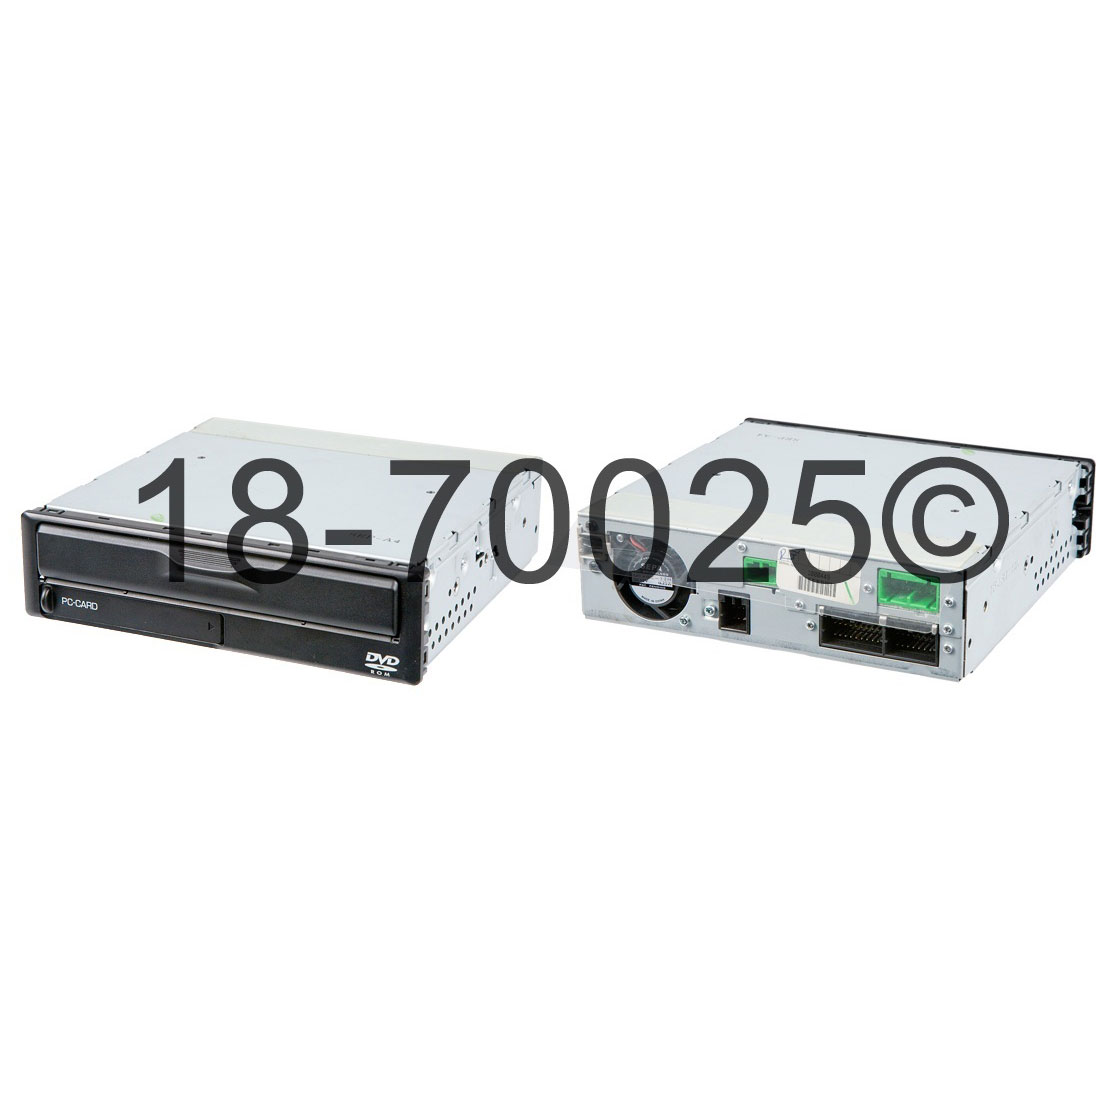 Acura TL                             DVD Navigation ModuleDVD Navigation Module